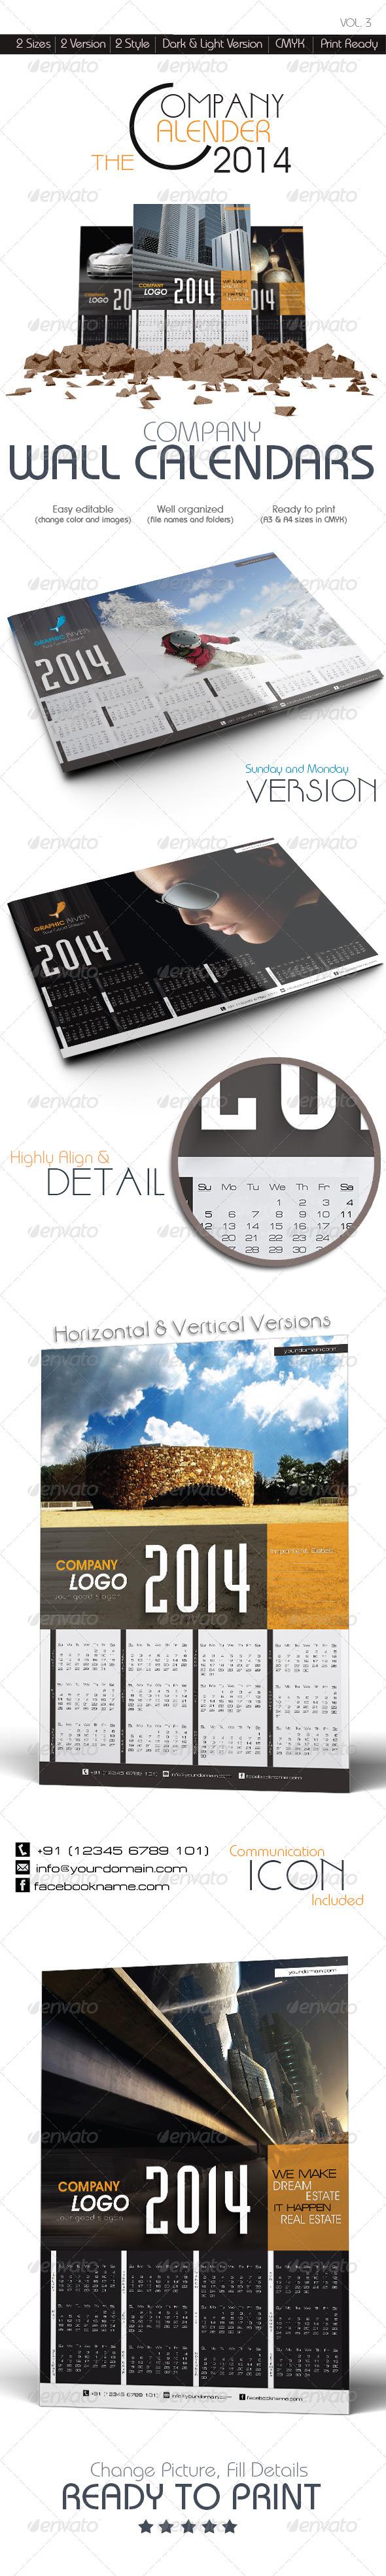 GraphicRiver The Company Wall Calendars 6013687